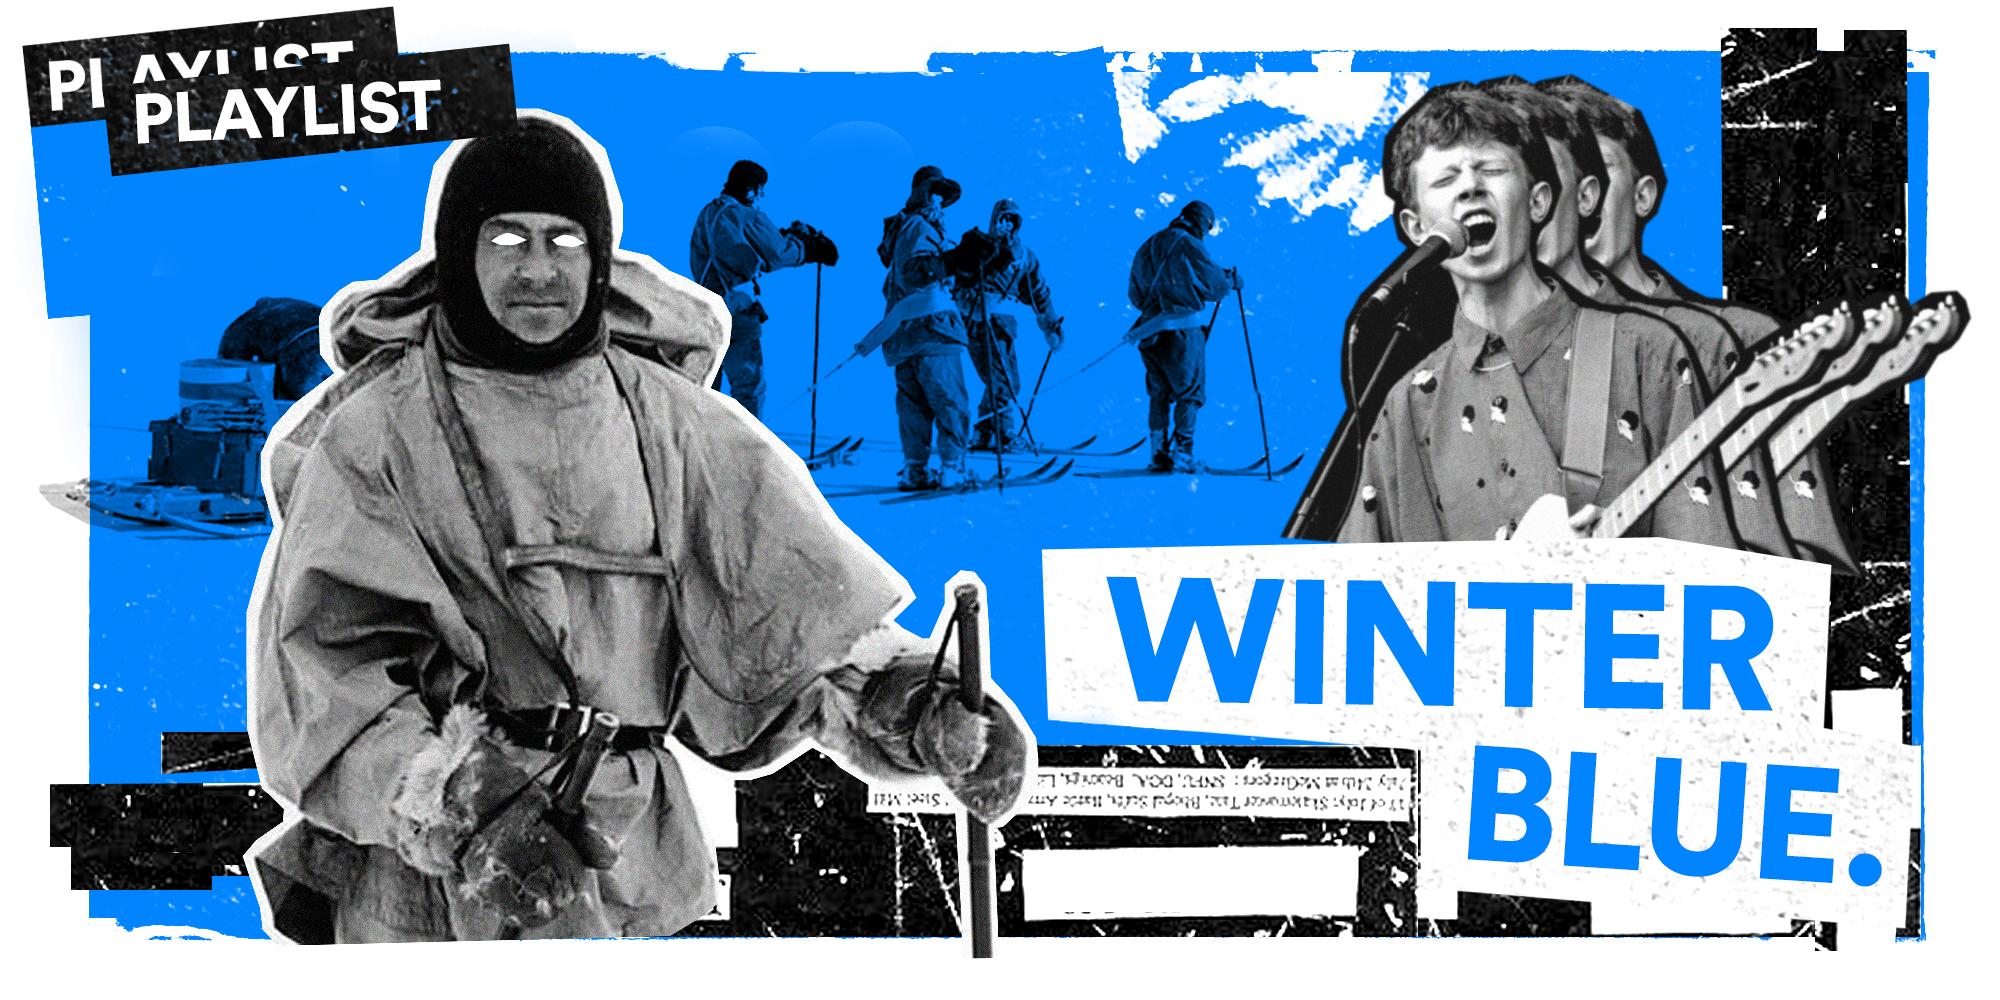 Blog-playlist-winter.jpg